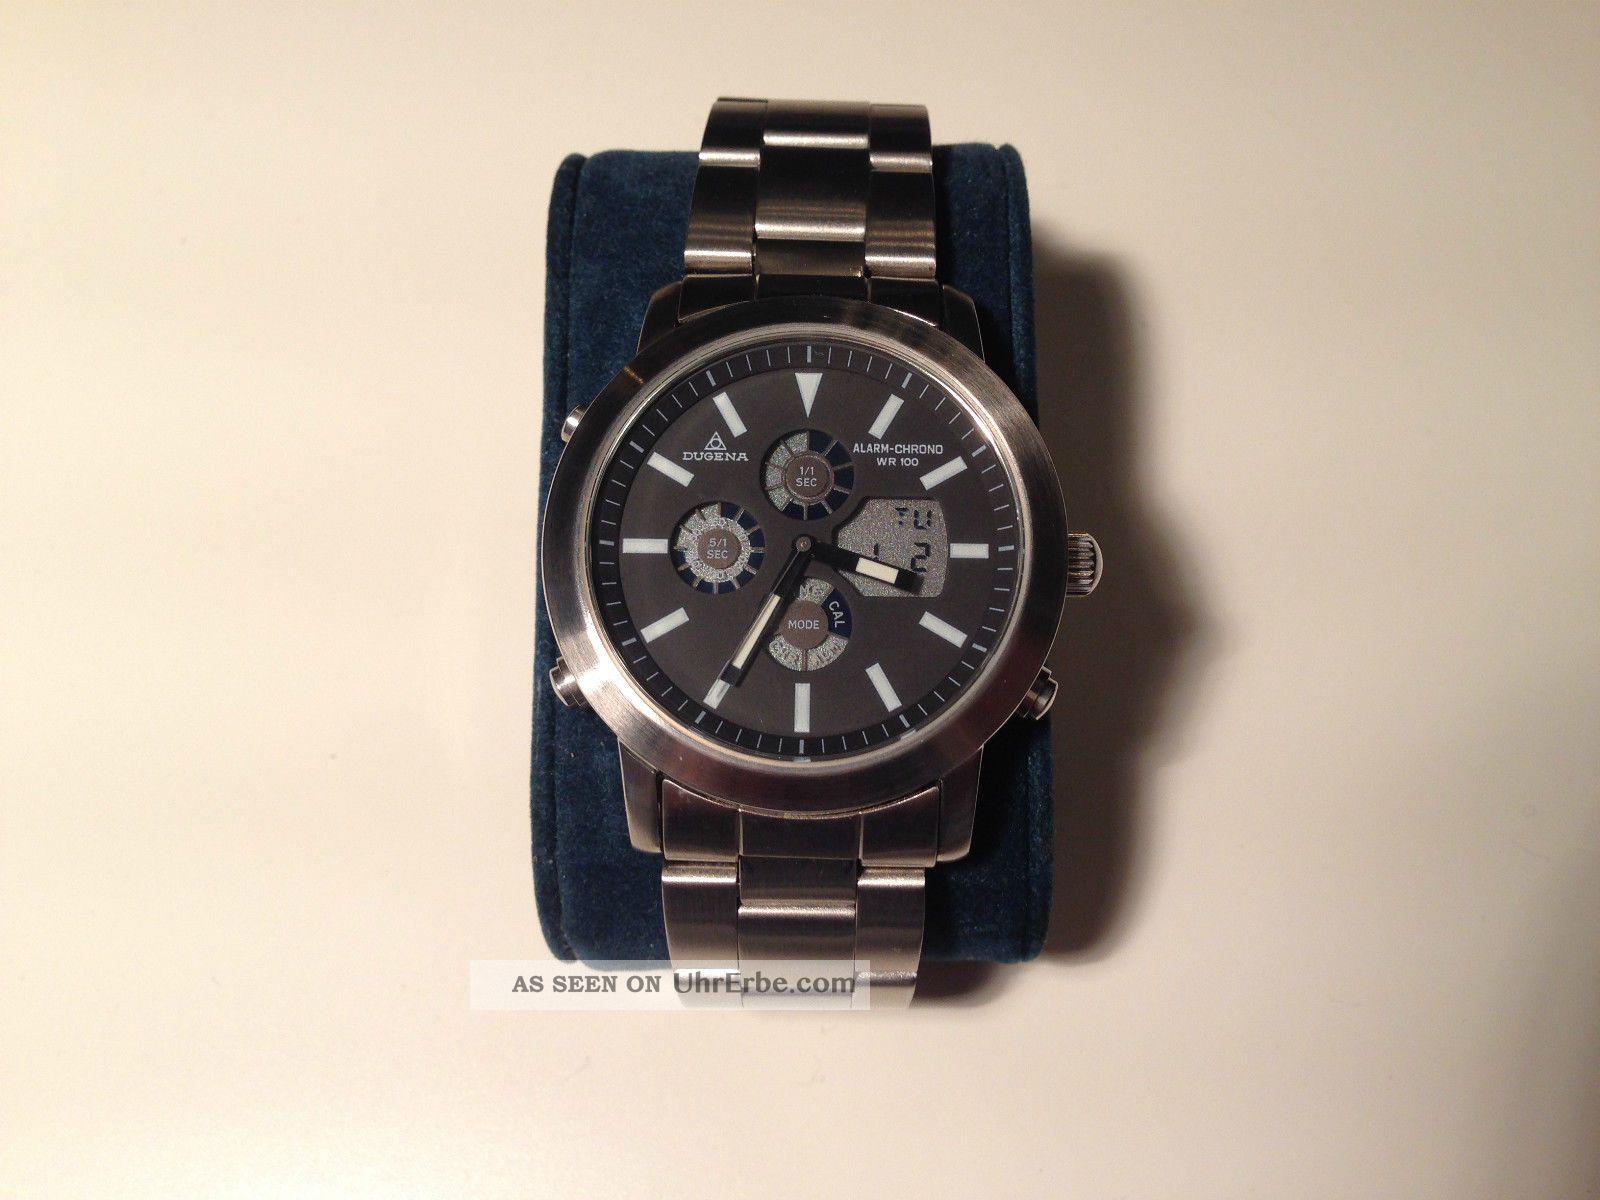 Dugena Alarm Chronograph Herren Armband Uhr,  Ungetragen,  Cal ;cr50 Armbanduhren Bild